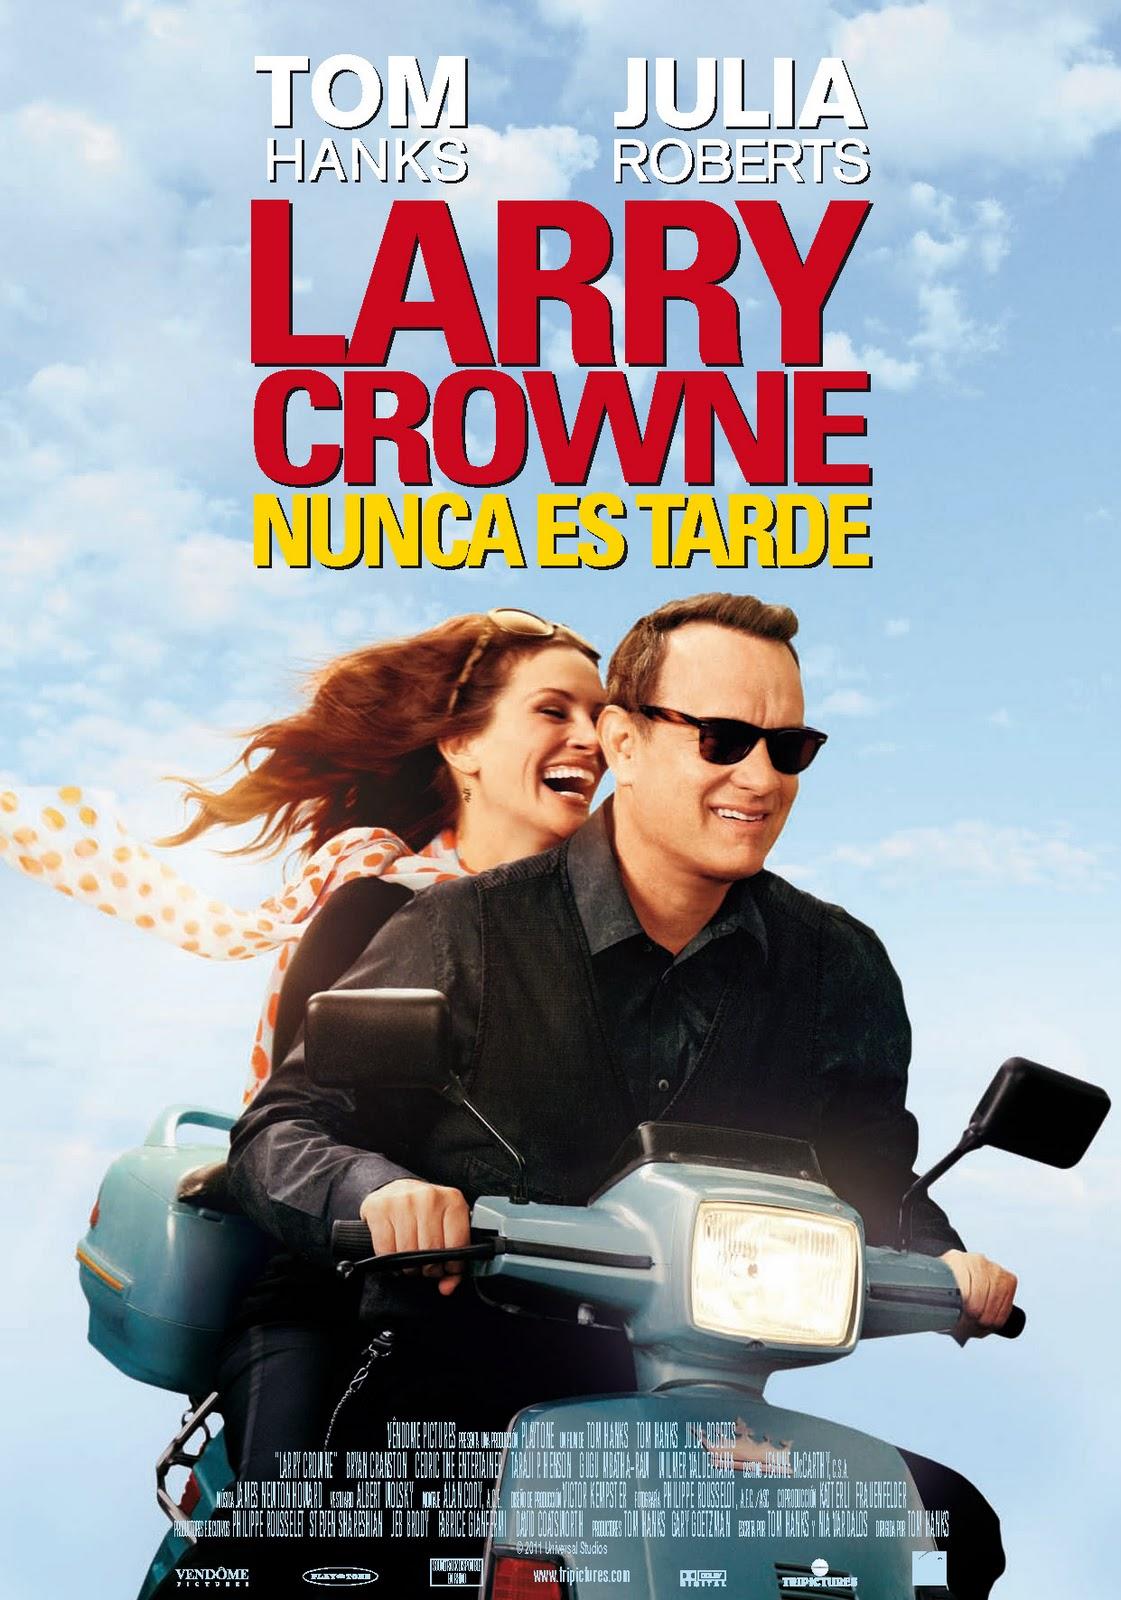 http://2.bp.blogspot.com/-7W8y58DqE58/Tq9dHoFY10I/AAAAAAAAACM/ZiNxd81fKqk/s1600/larry_crowne.jpg